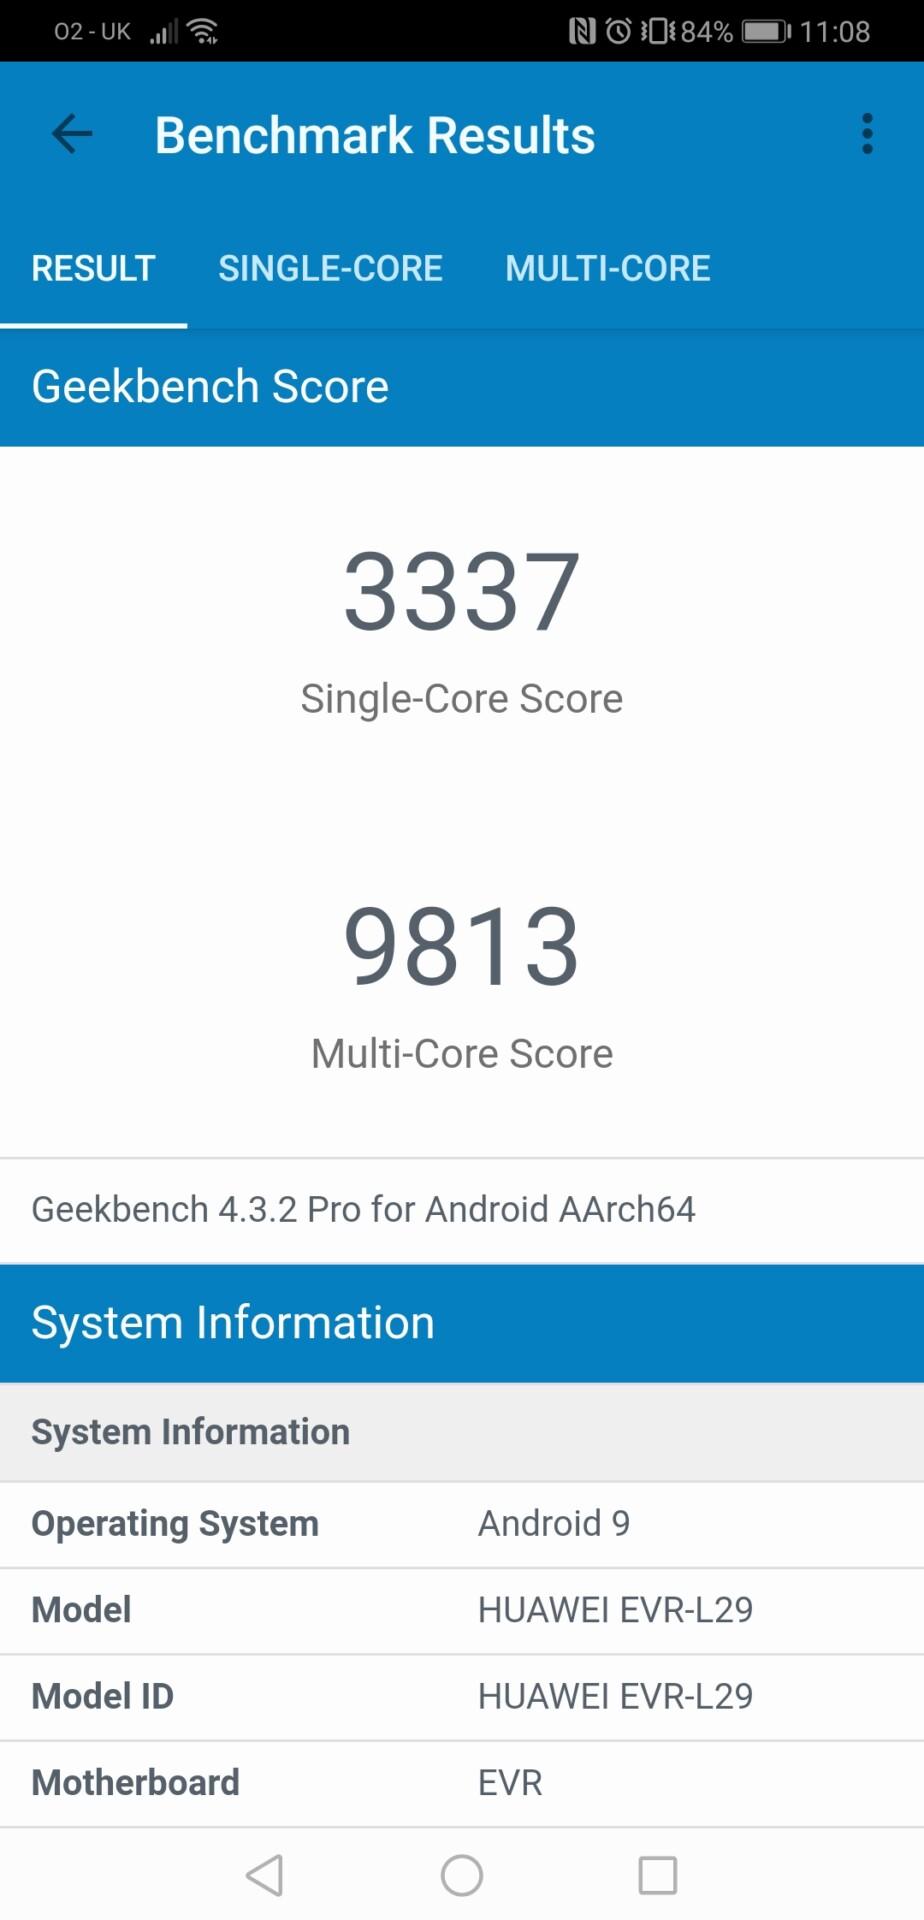 uawei mate 20 x geekbench benchmark